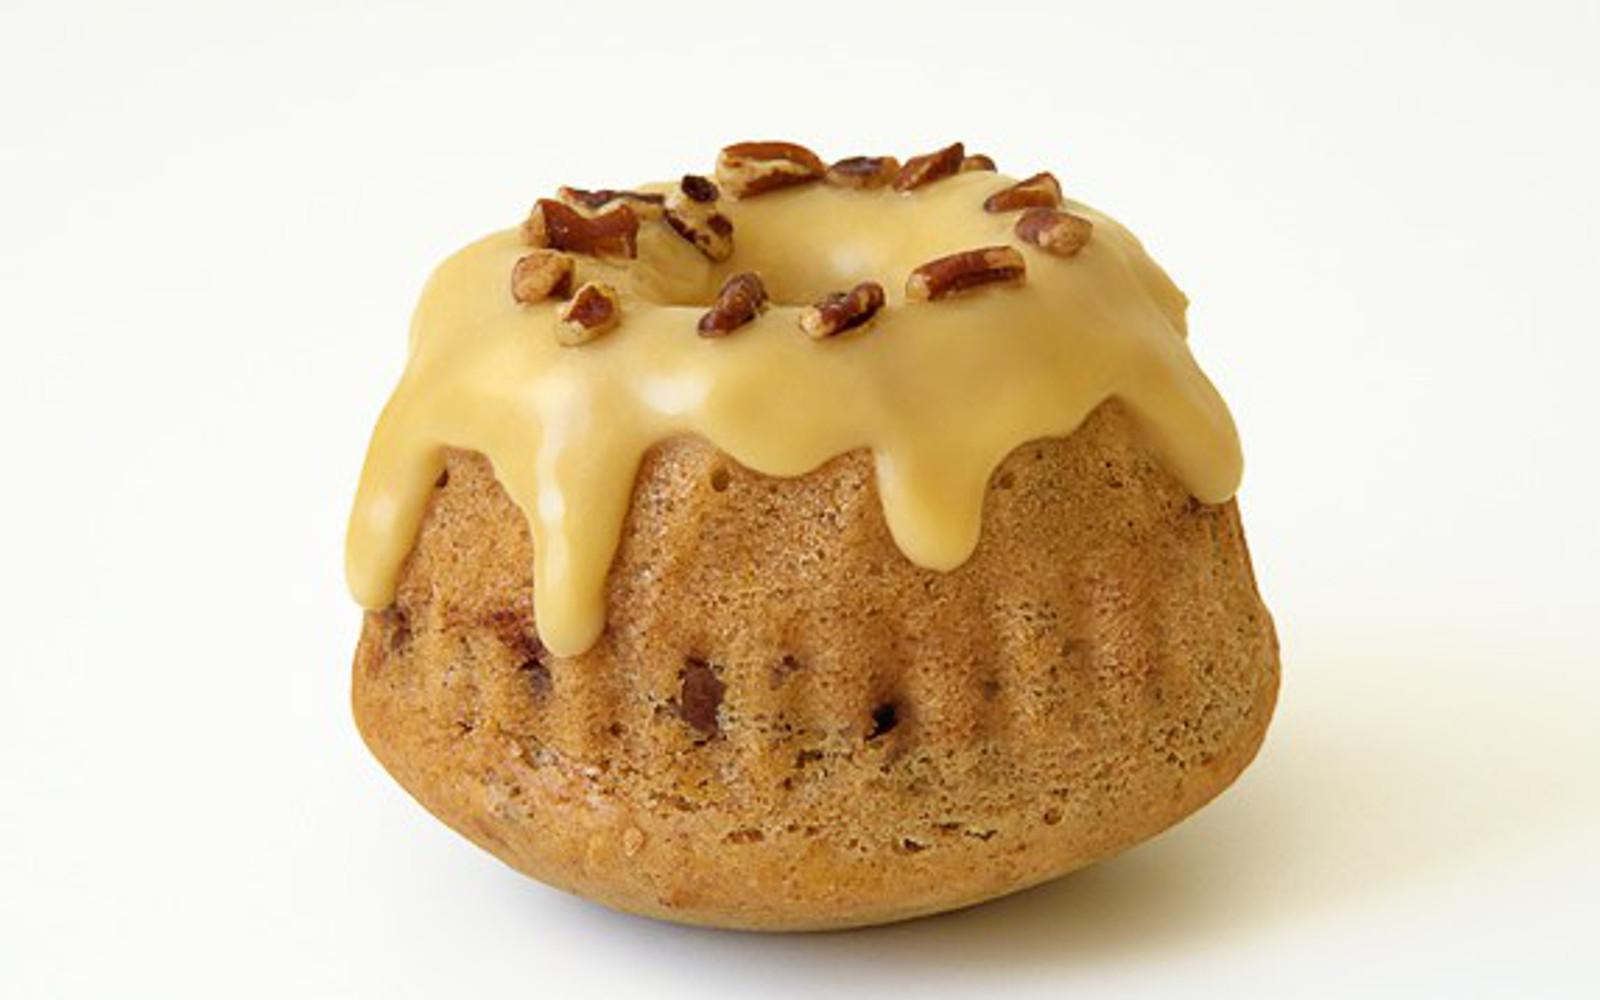 Maple Glazed Cinnamon Pecan Mini Cakes [Vegan]